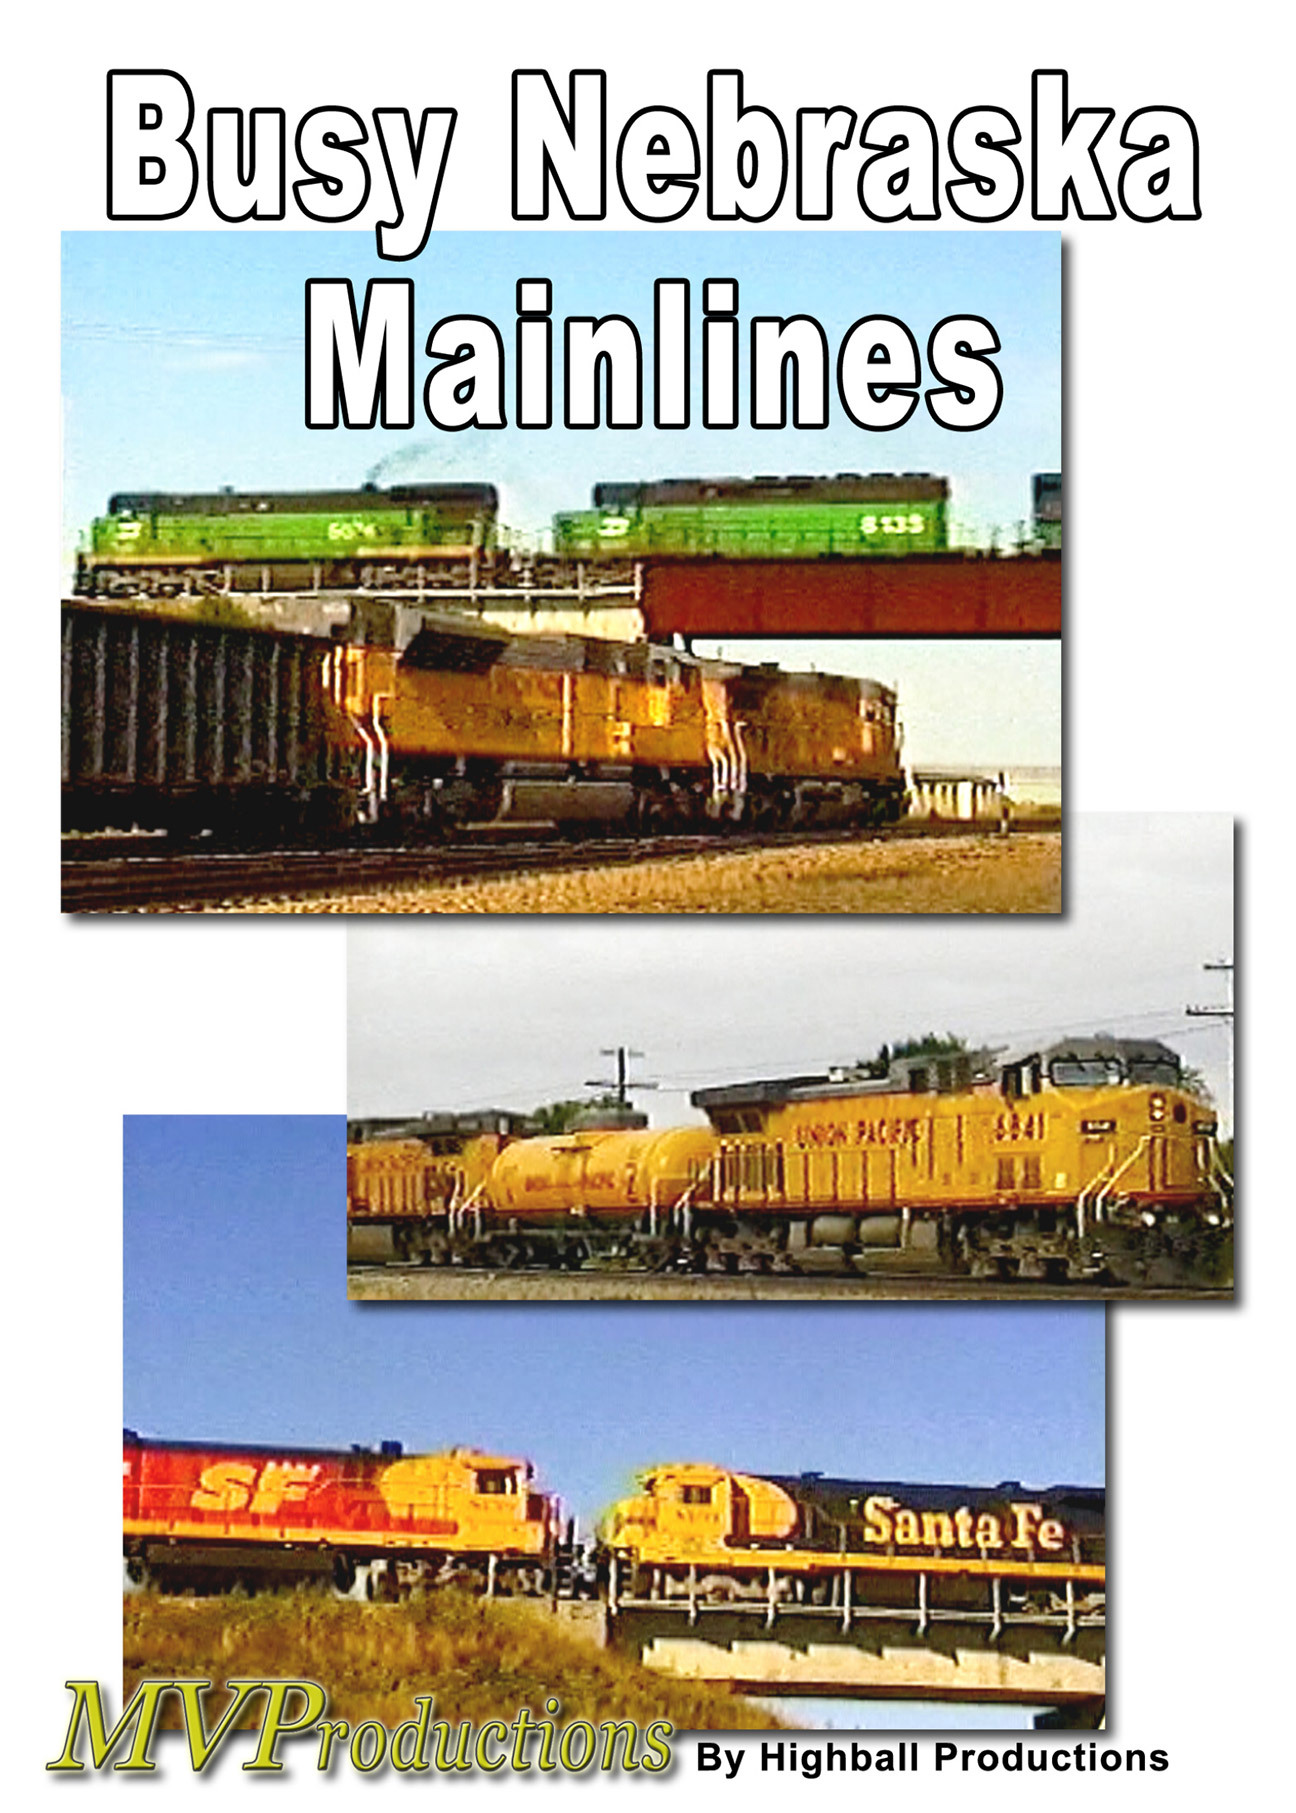 Busy Nebraska Mainlines Midwest Video Productions MVBNM 601577880271